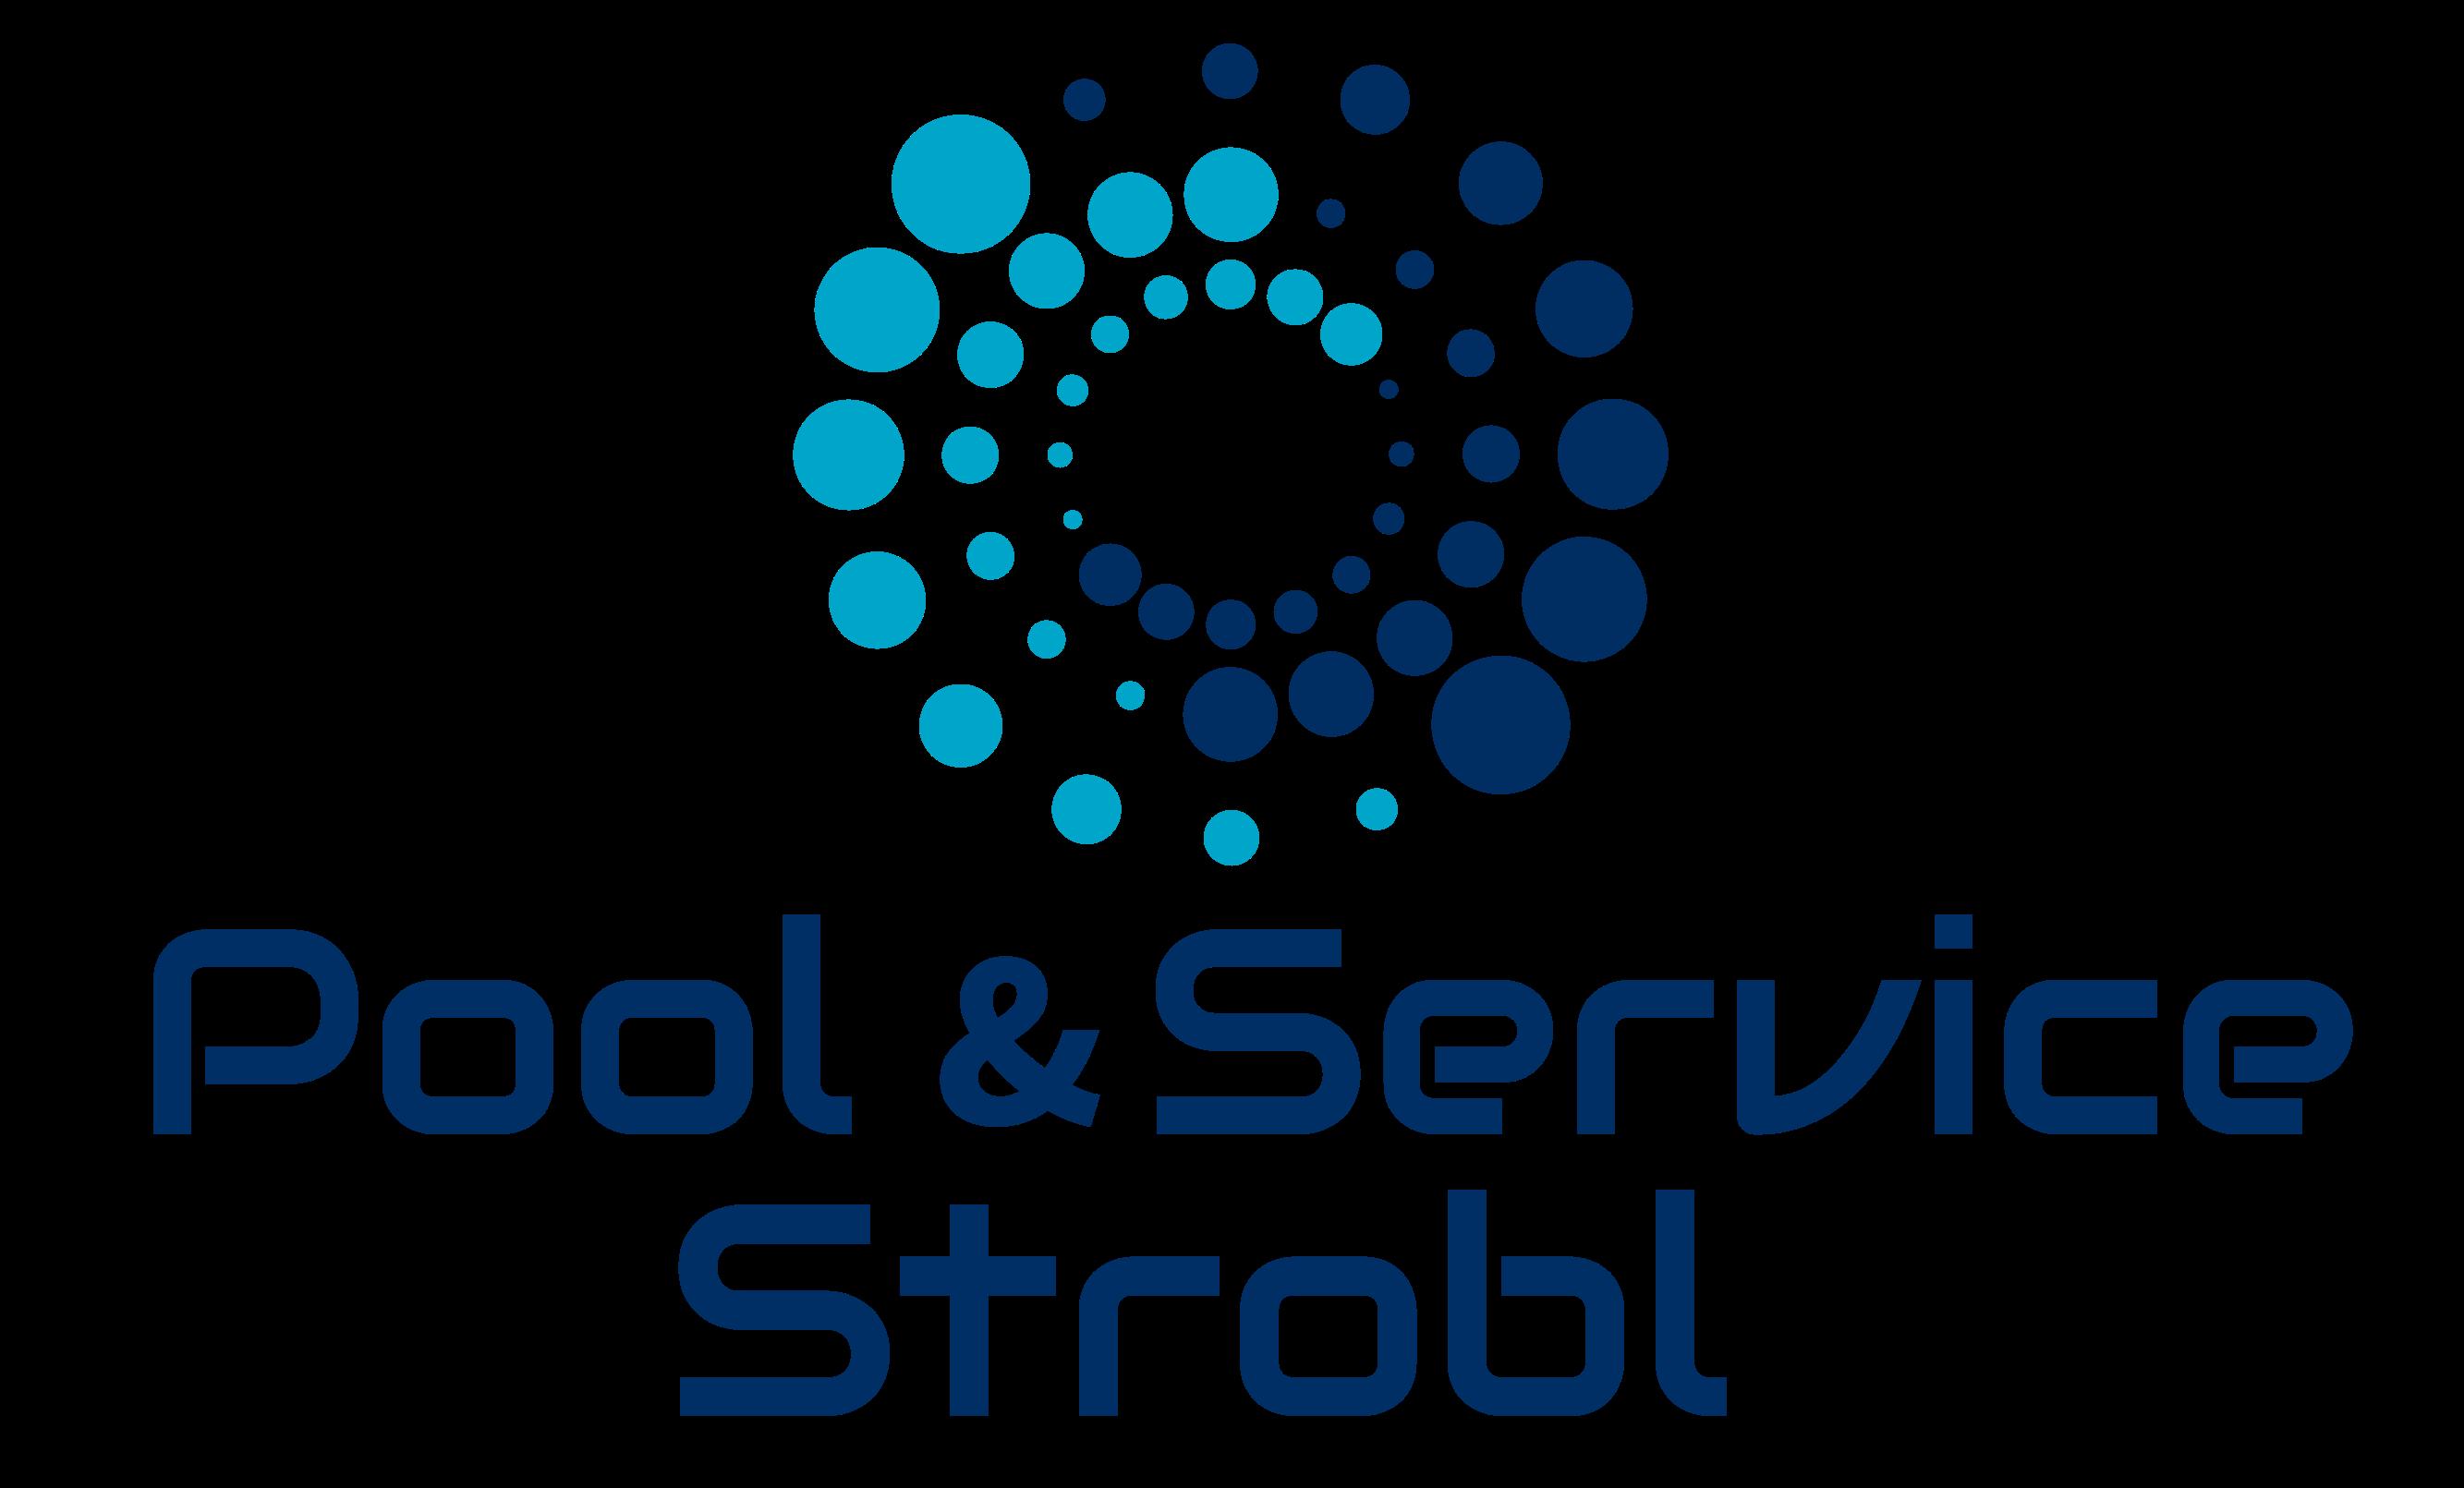 Pool & Service Strobl